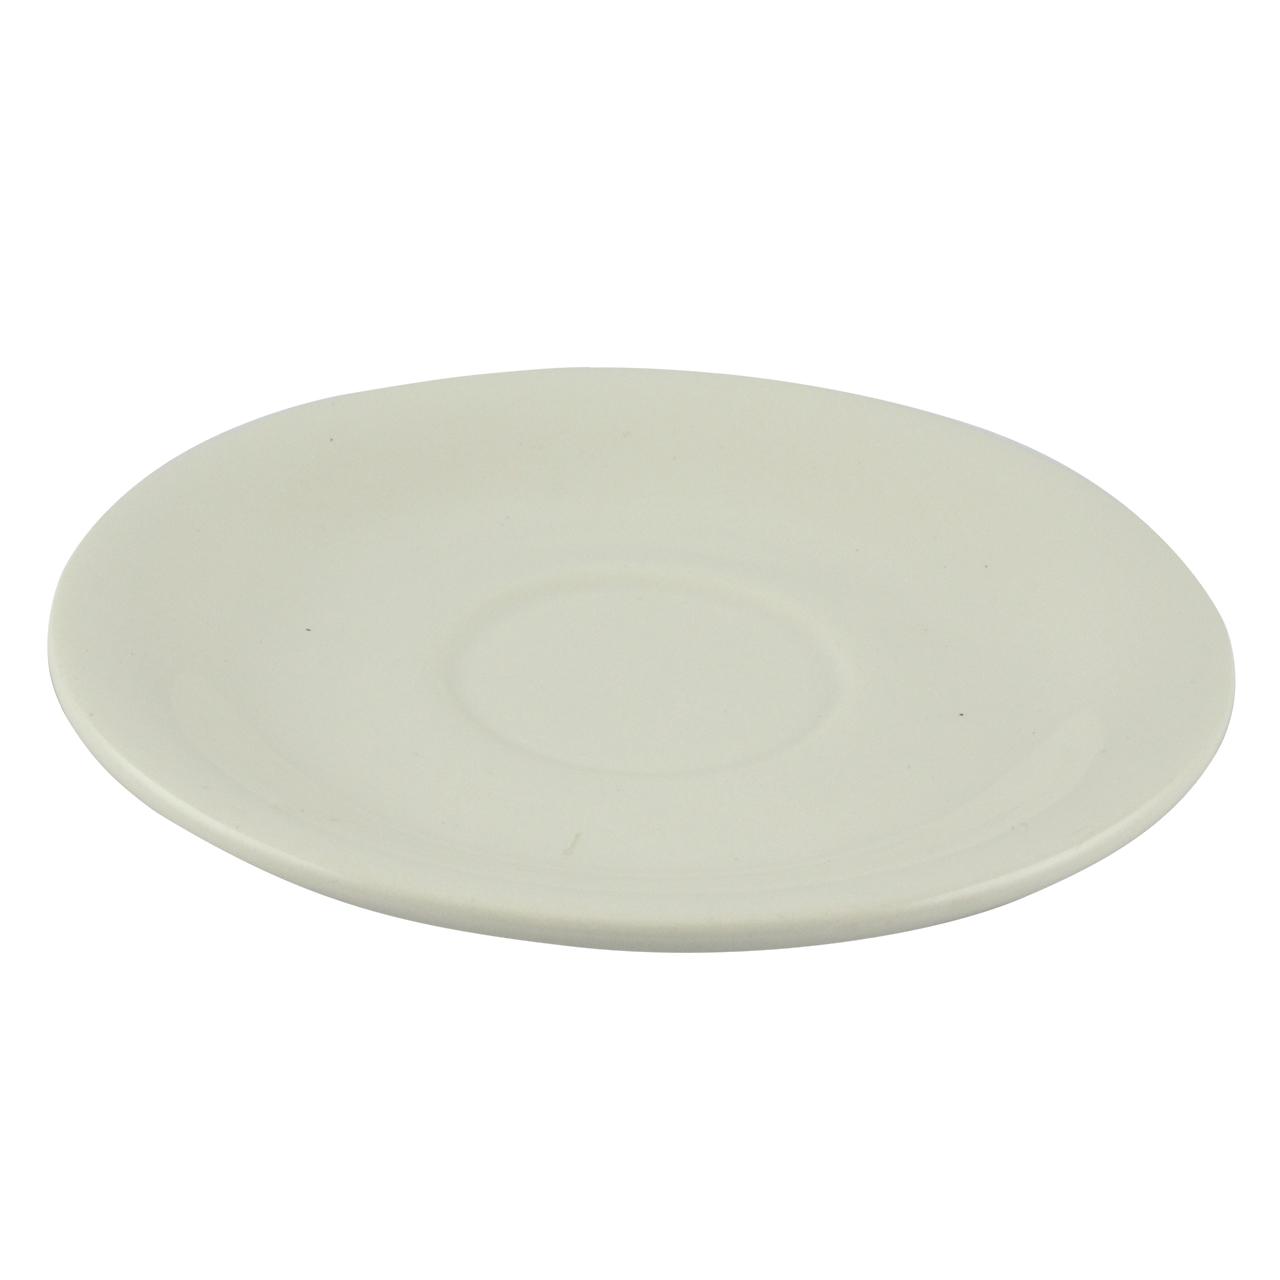 Farfurie Din Ceramica Alba 12 Cm